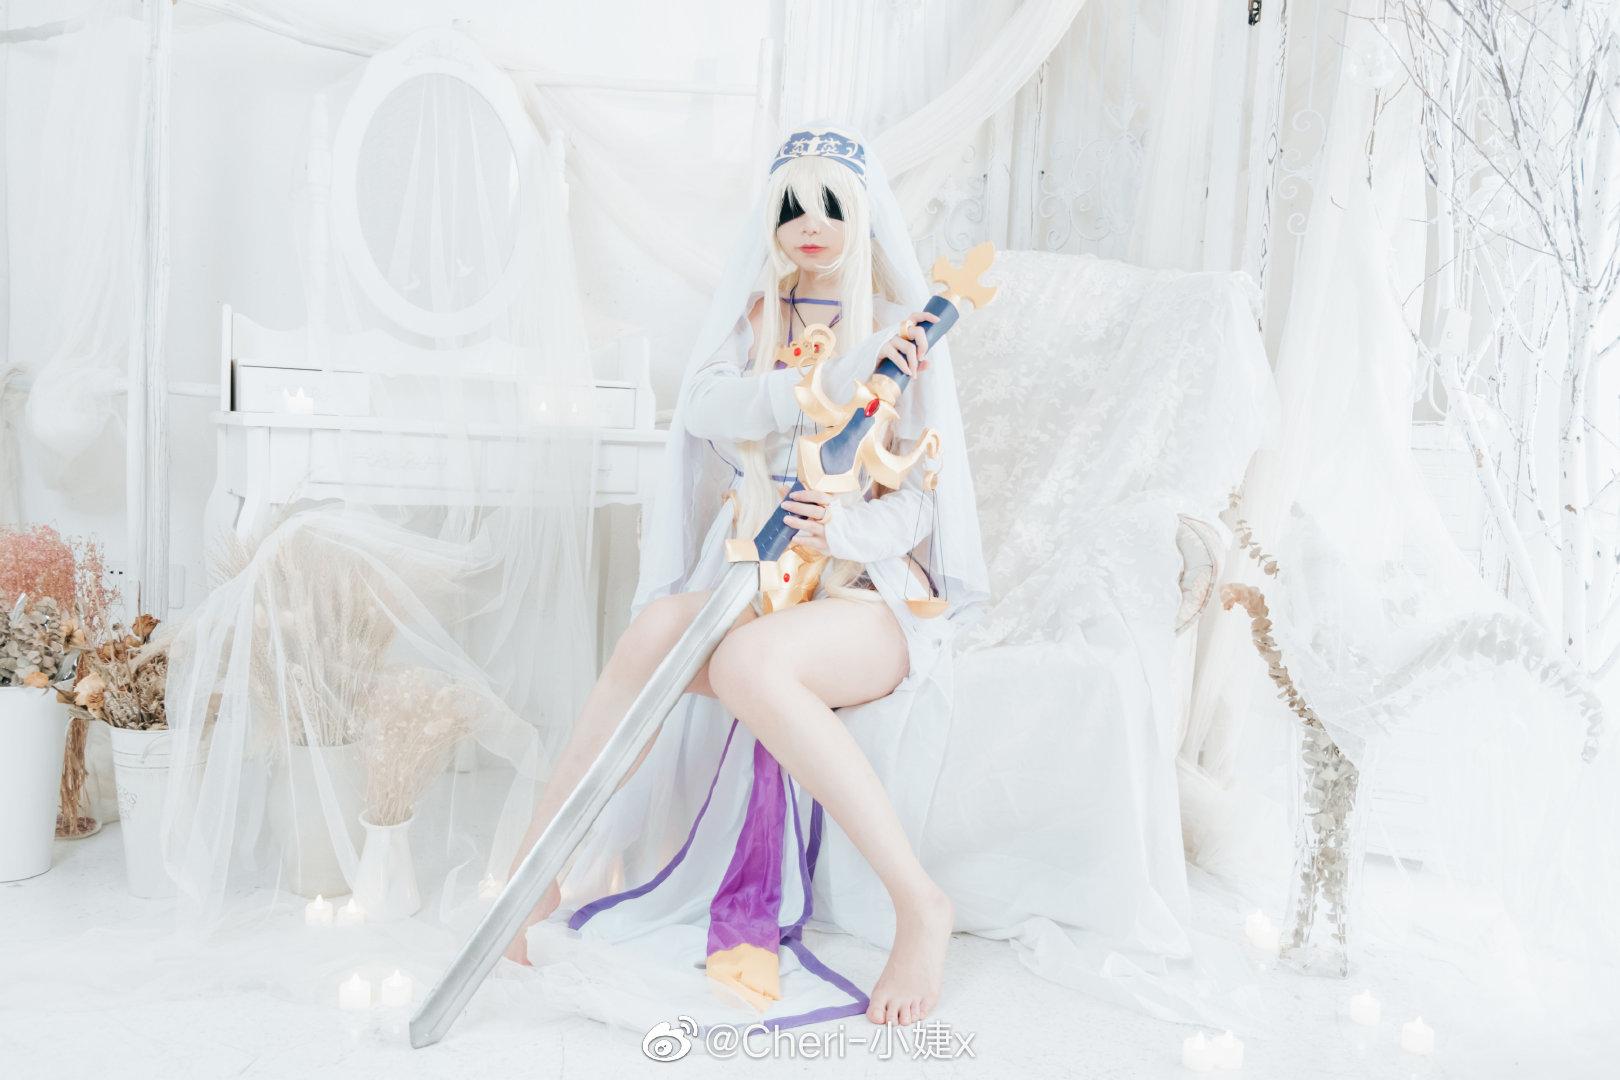 [COS]哥布林杀手 剑之圣女 @Cheri-小婕x COSPLAY-第3张